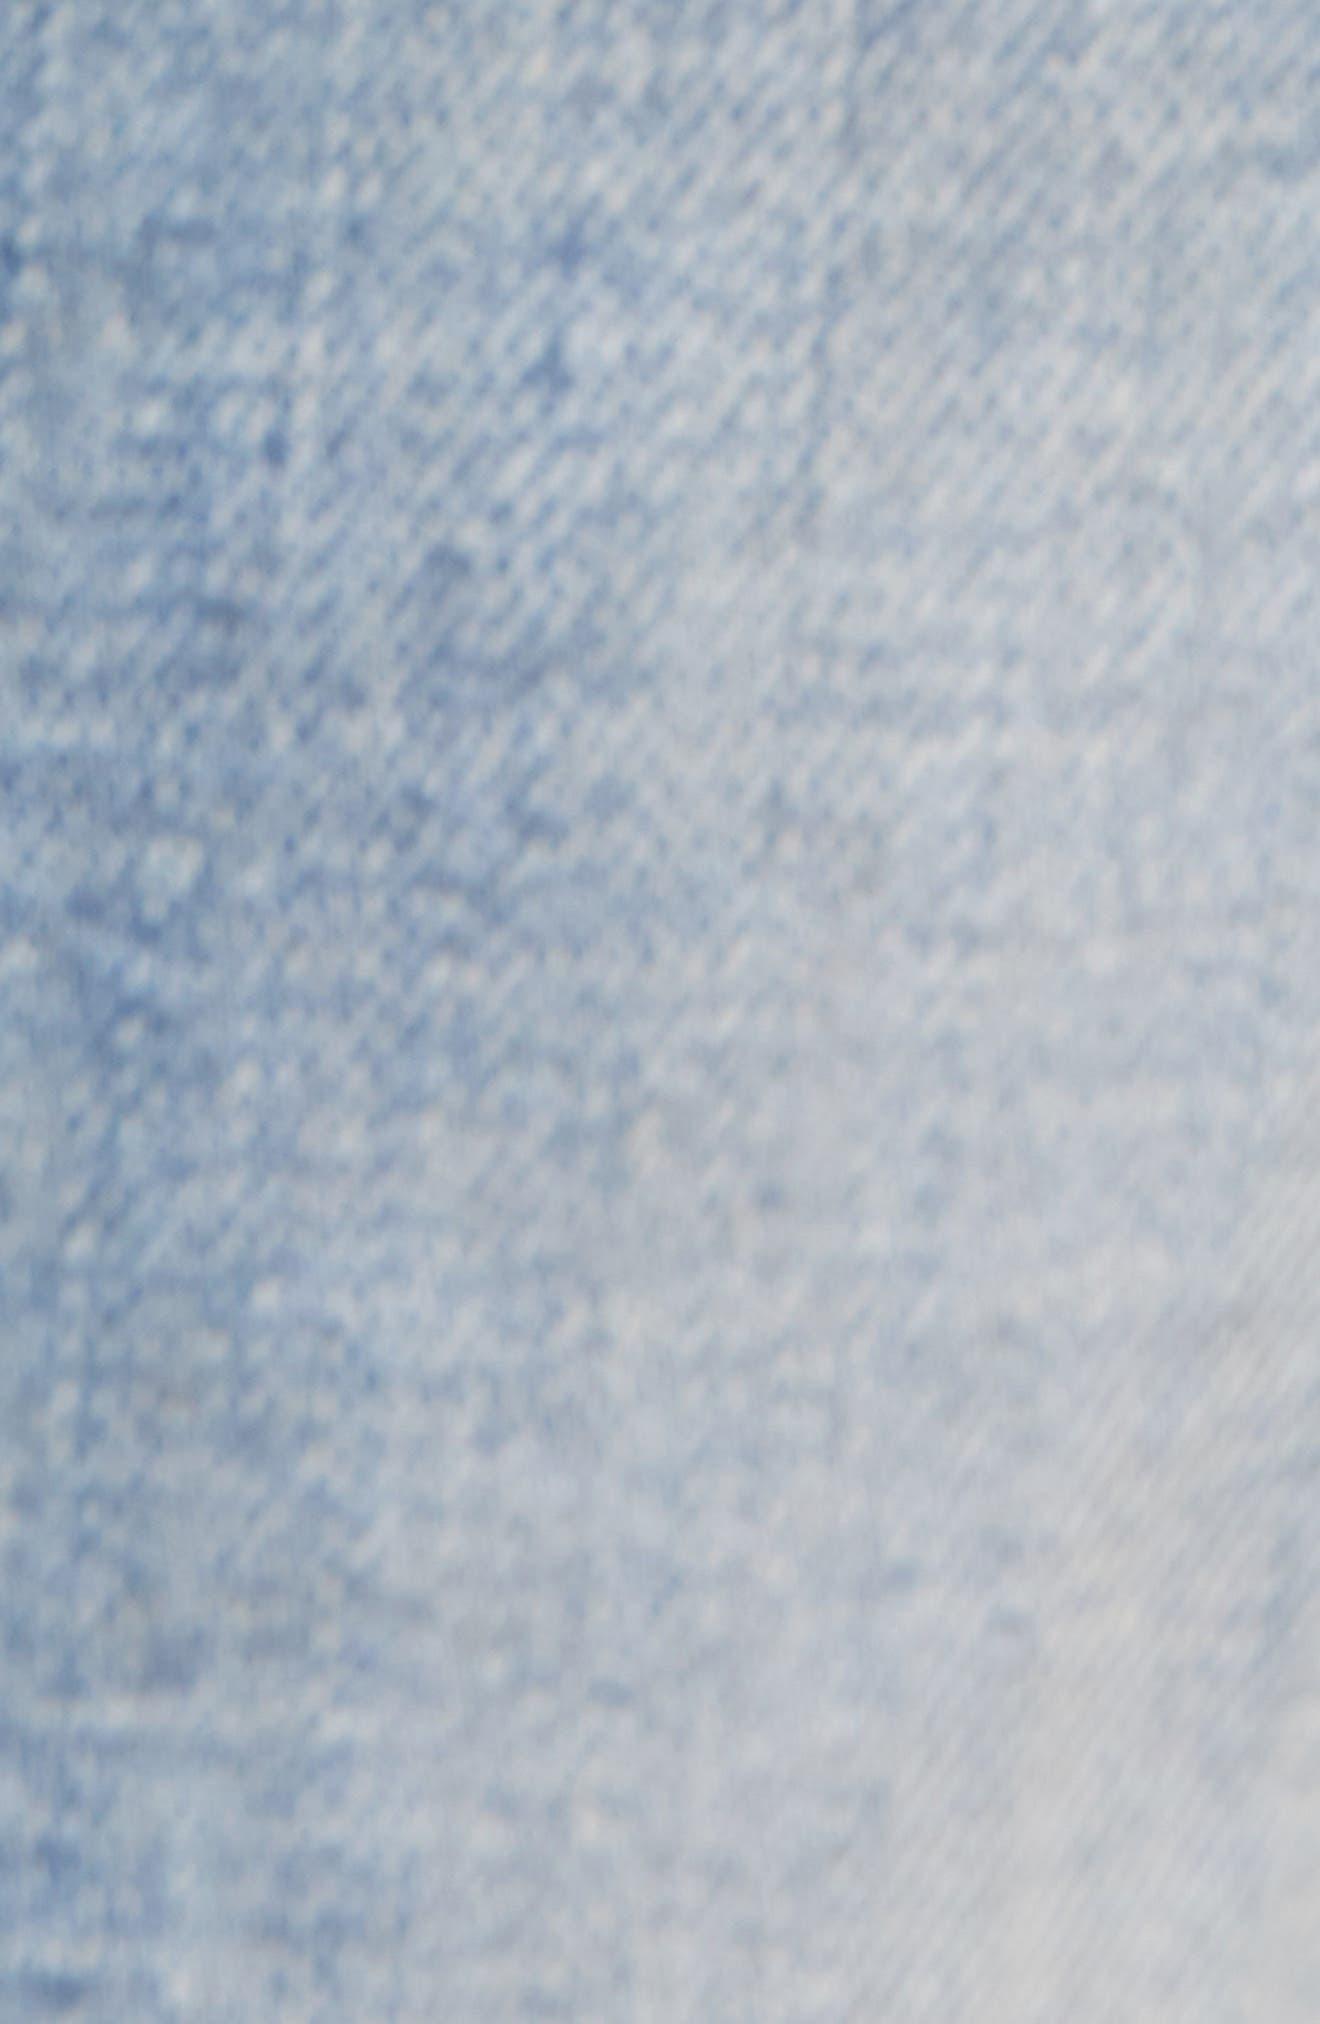 Sartor Slouchy Skinny Fit Jeans,                             Alternate thumbnail 5, color,                             Los Feliz